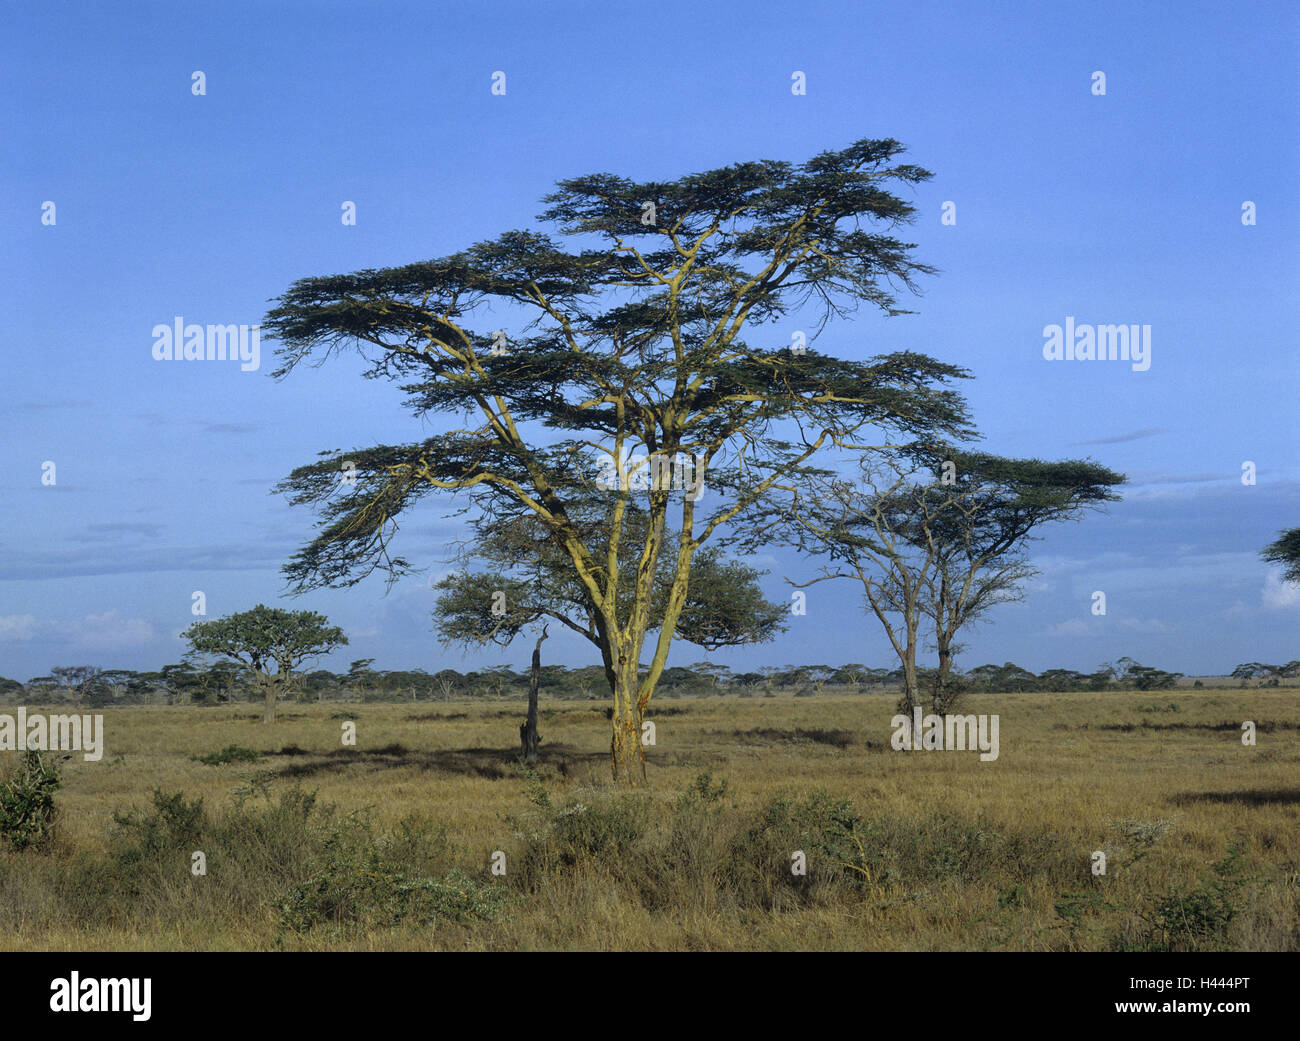 Africa, Ngorongorokrater, display screen acacias, Acacia tortilis, Tanzania, mountains, scenery, nature, vegetation, - Stock Image